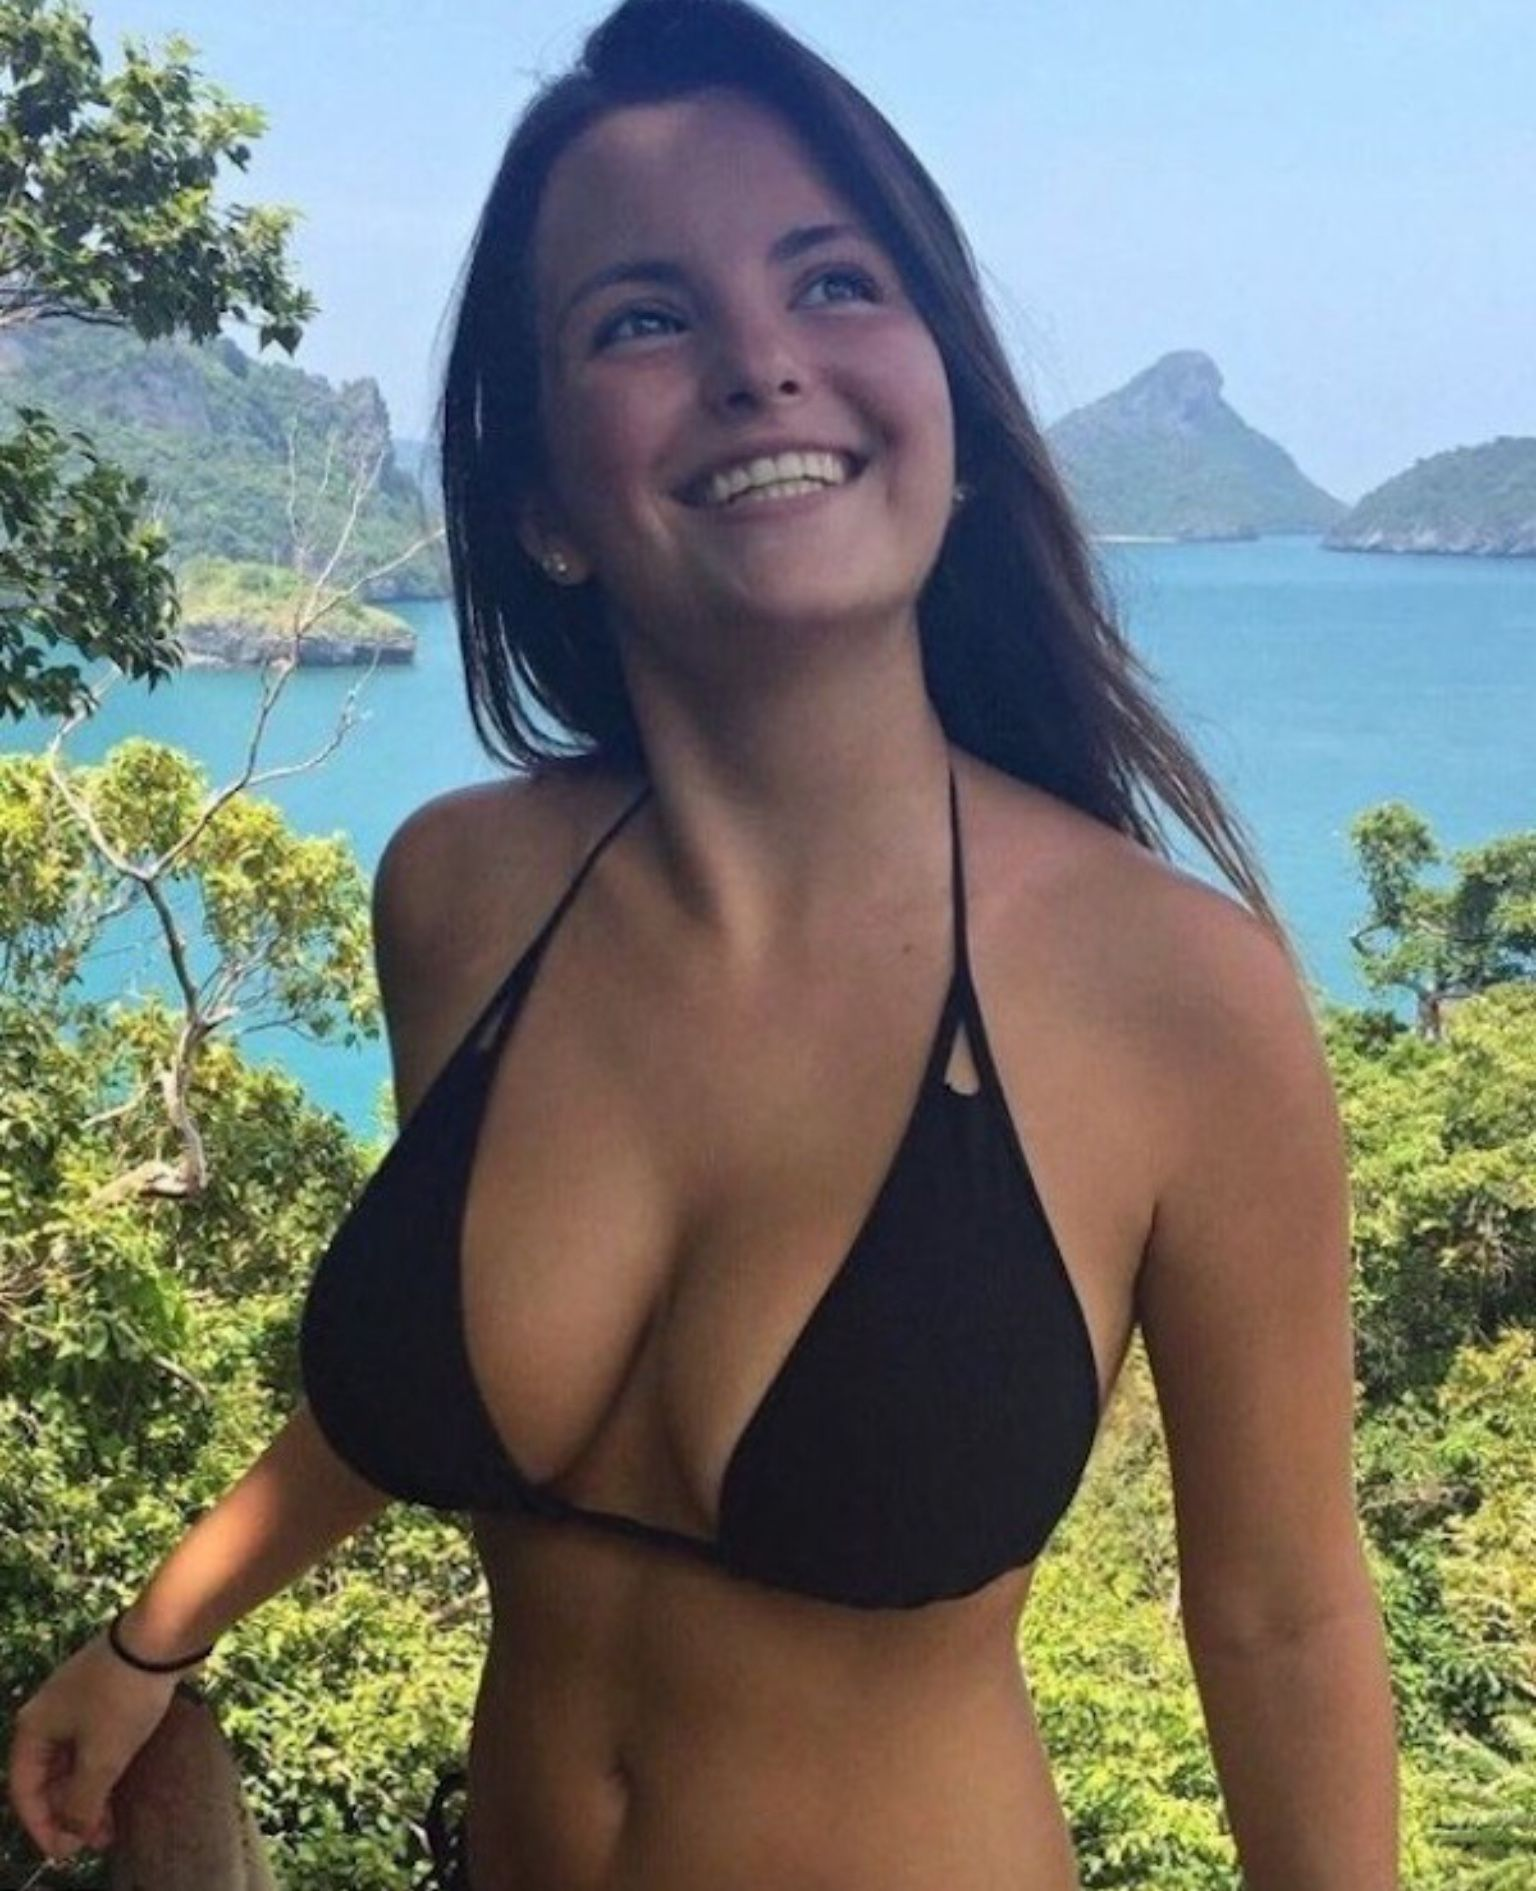 Teen busty bikini Kendall and